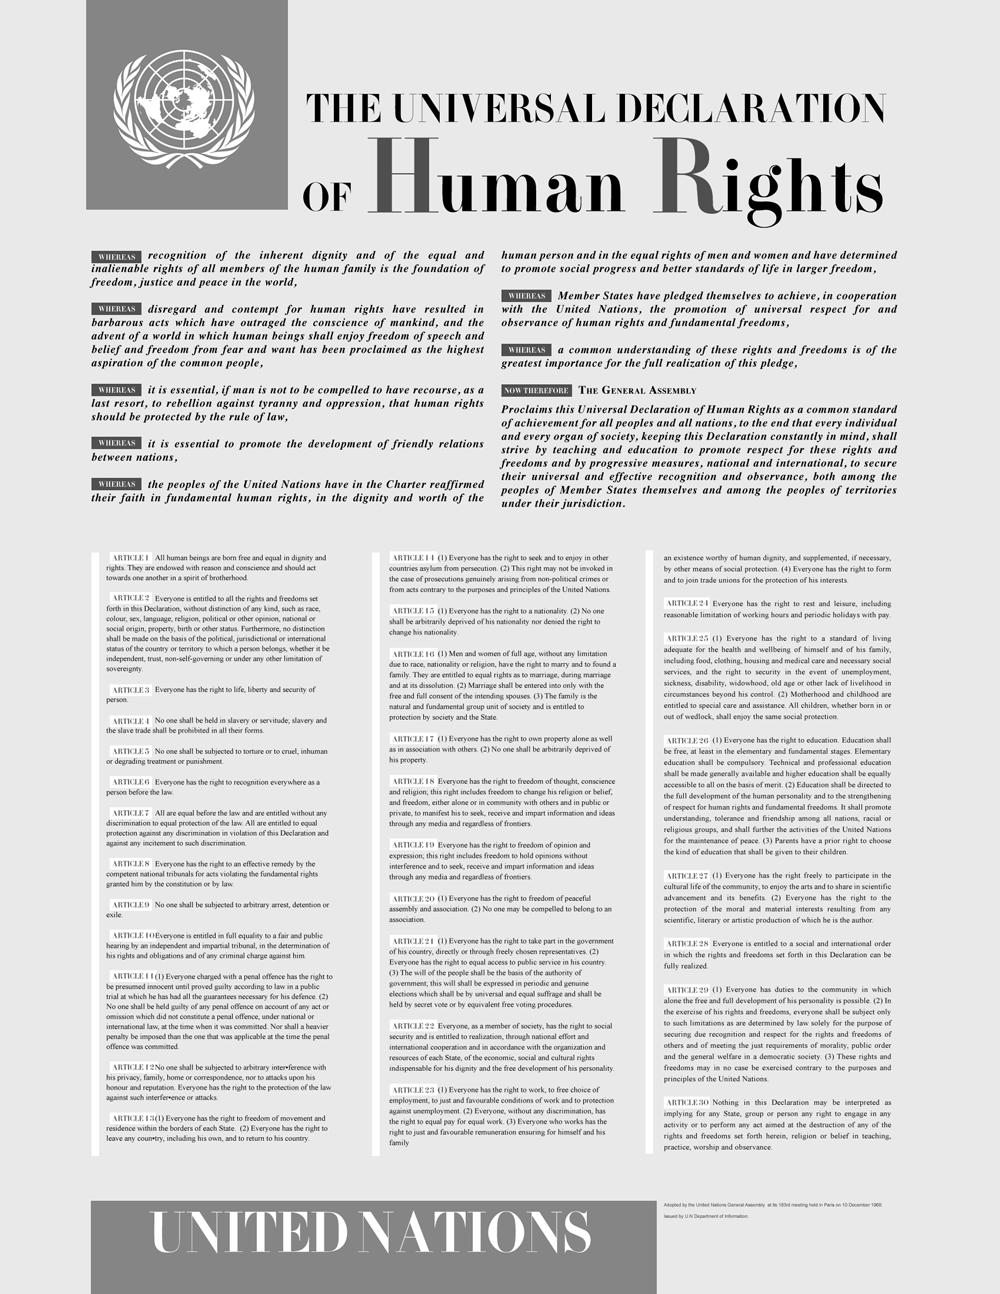 Human Rights Debate: Universalism Versus Relativism – OpEd